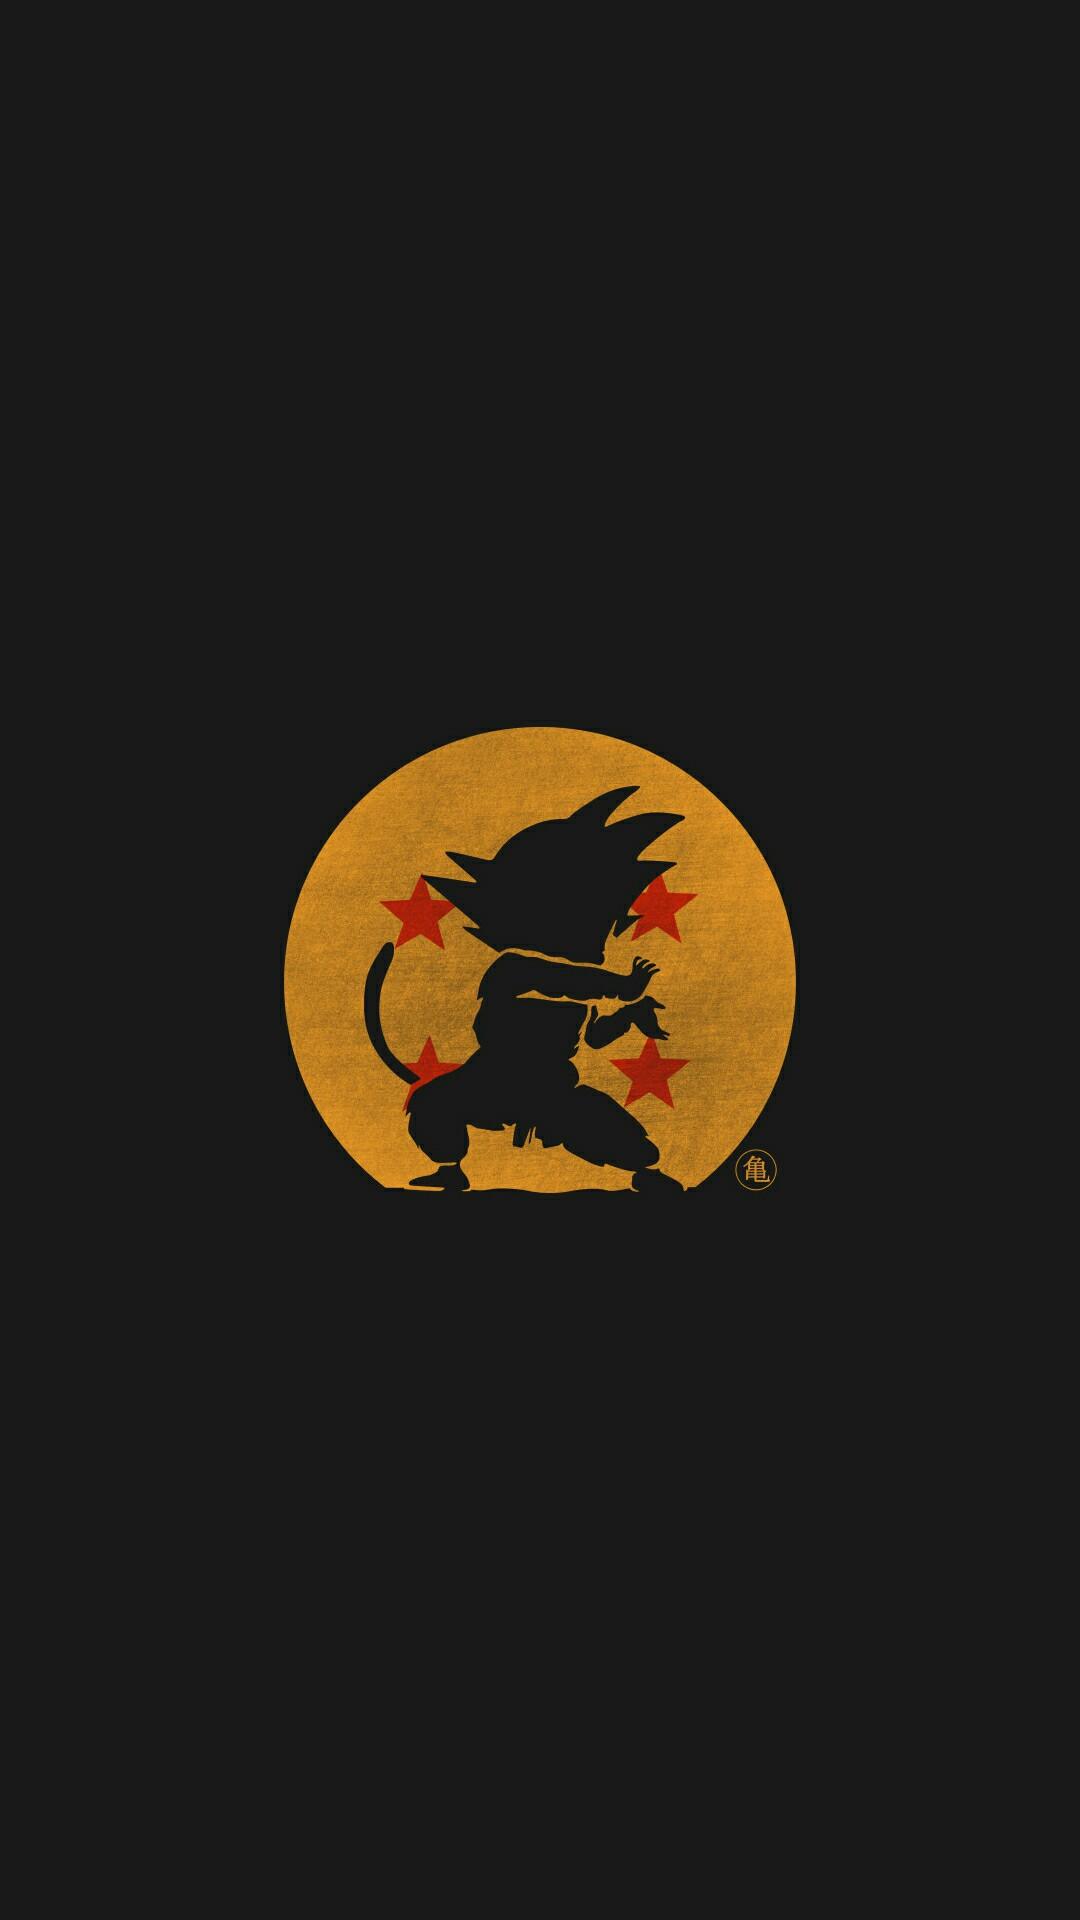 Fond d 39 cran dragon ball dragon ball z 1080x1920 jasonantonio17 1173939 fond d 39 cran - Photo de dragon ball z ...